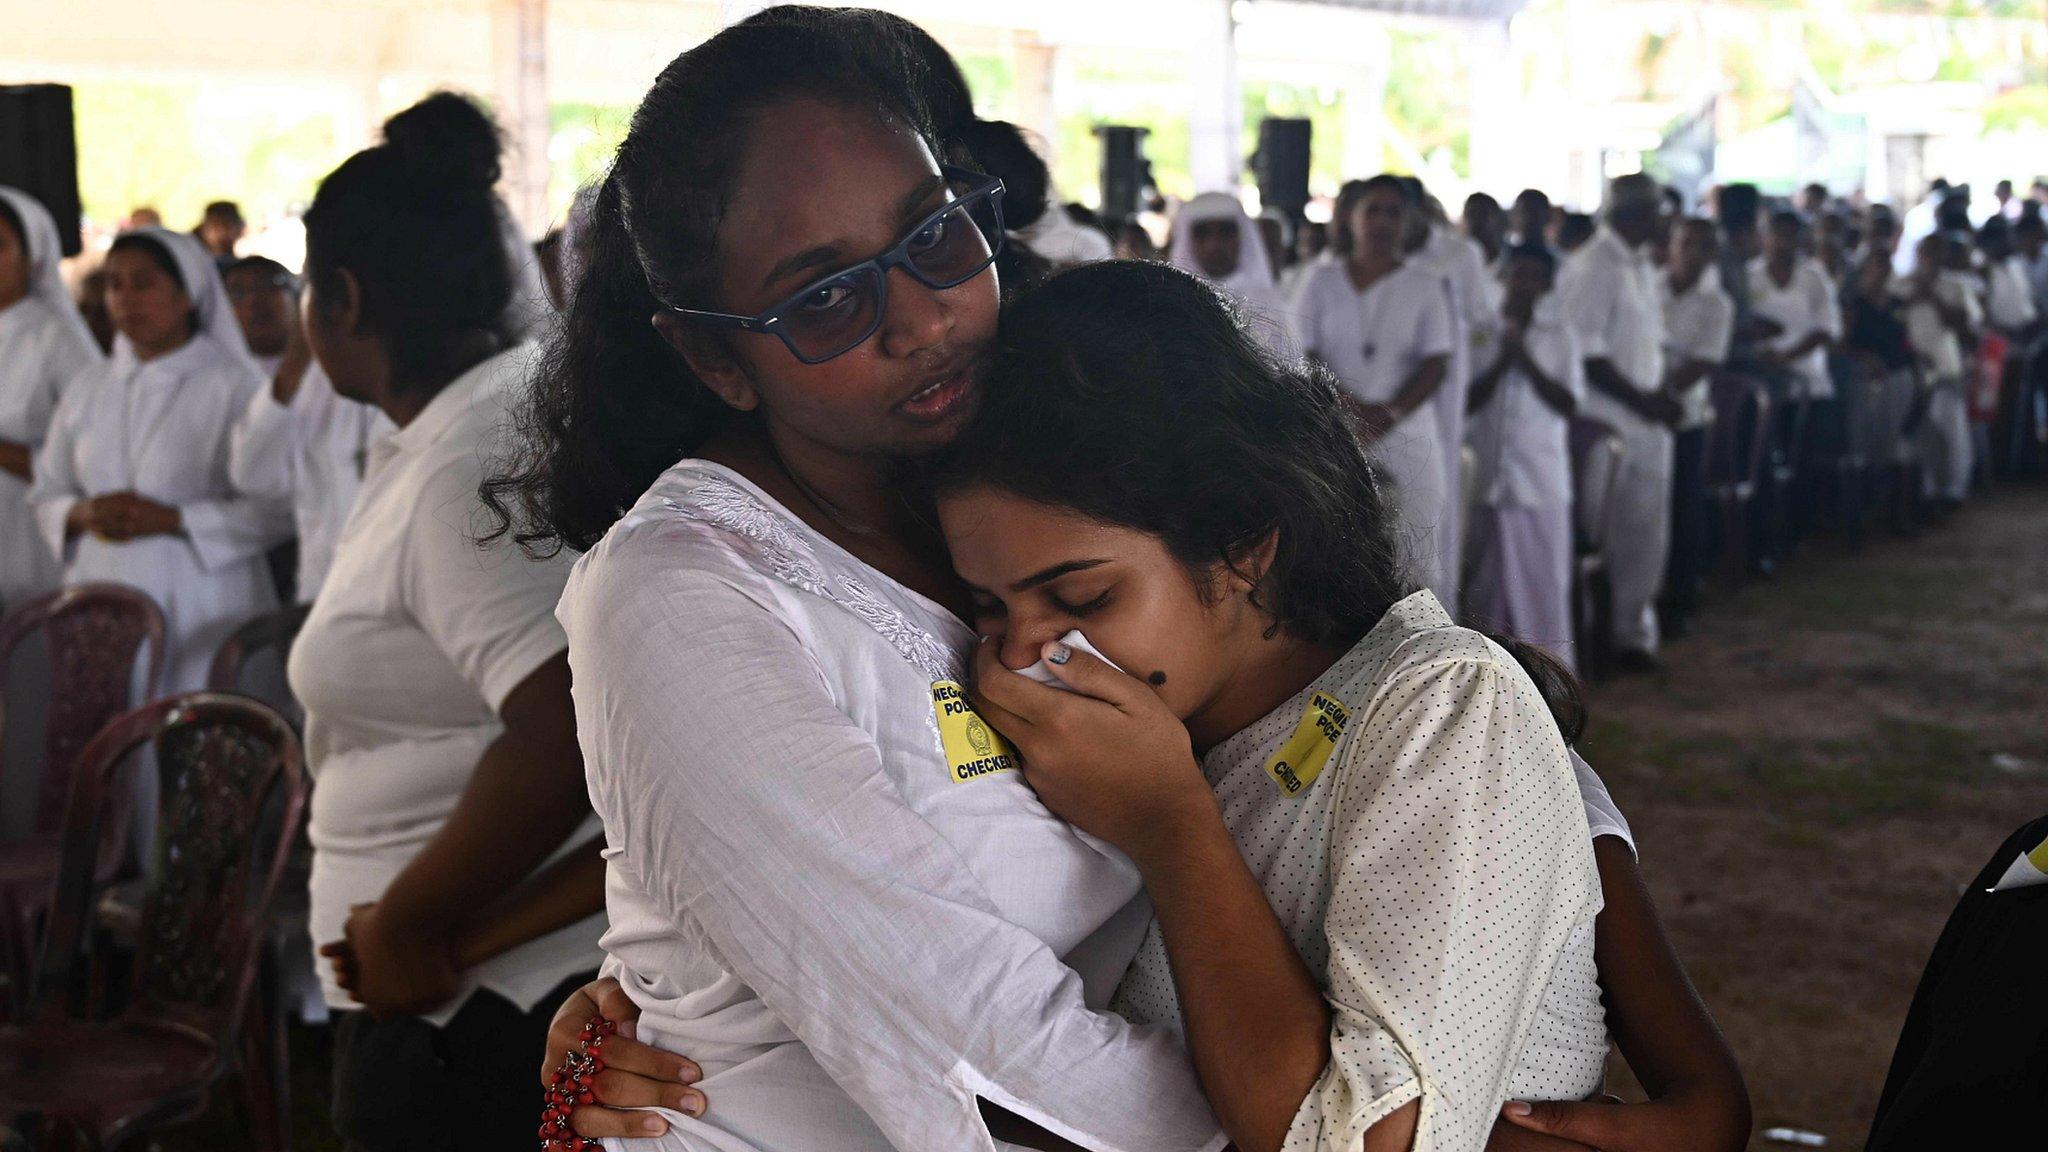 Sri Lanka attacks: Mass funerals held as nation mourns